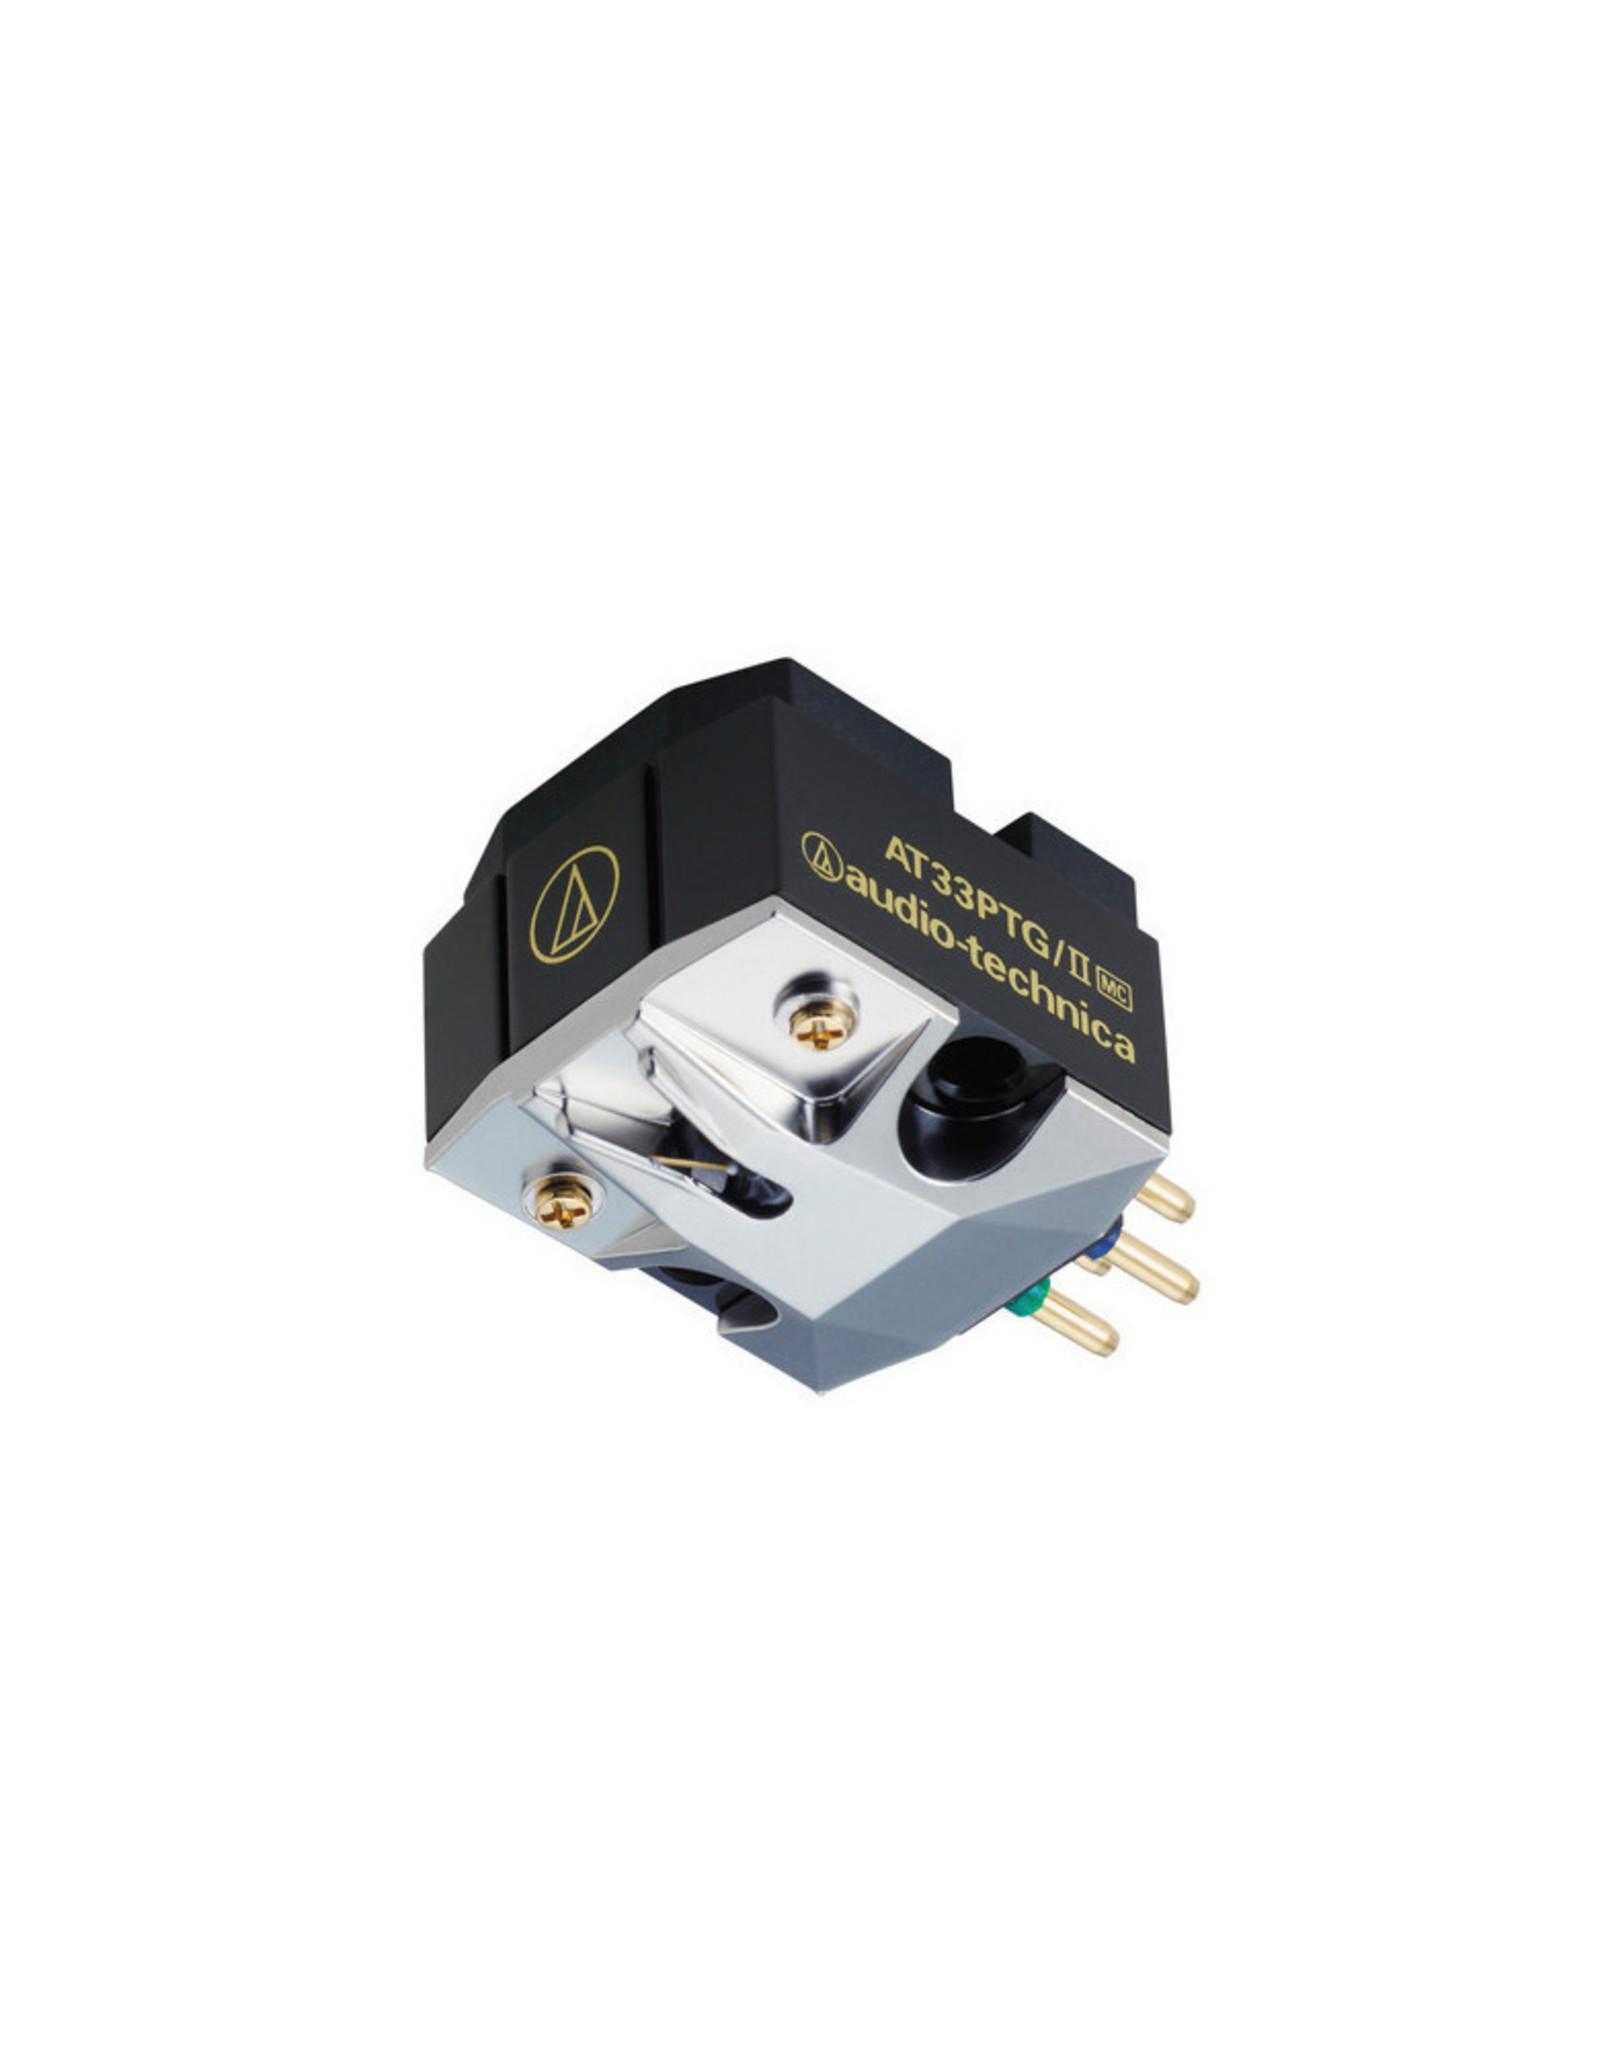 Audio-Technica Audio-Technica AT33PTG/2 Microlinear MC Phono Cartridge